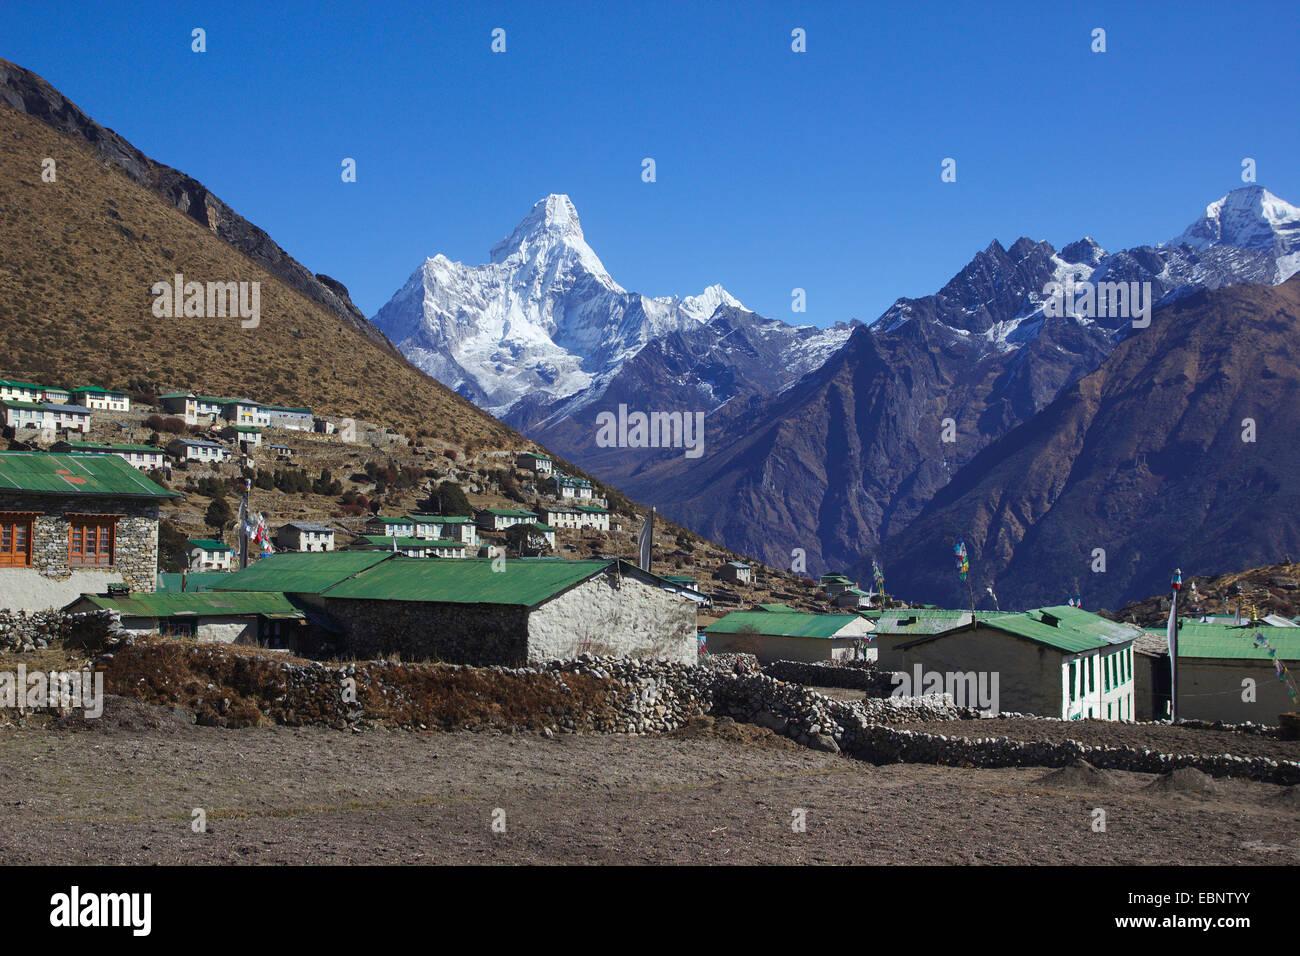 Ama Dablam view from Khumjung, Nepal, Himalaya, Khumbu Himal - Stock Image